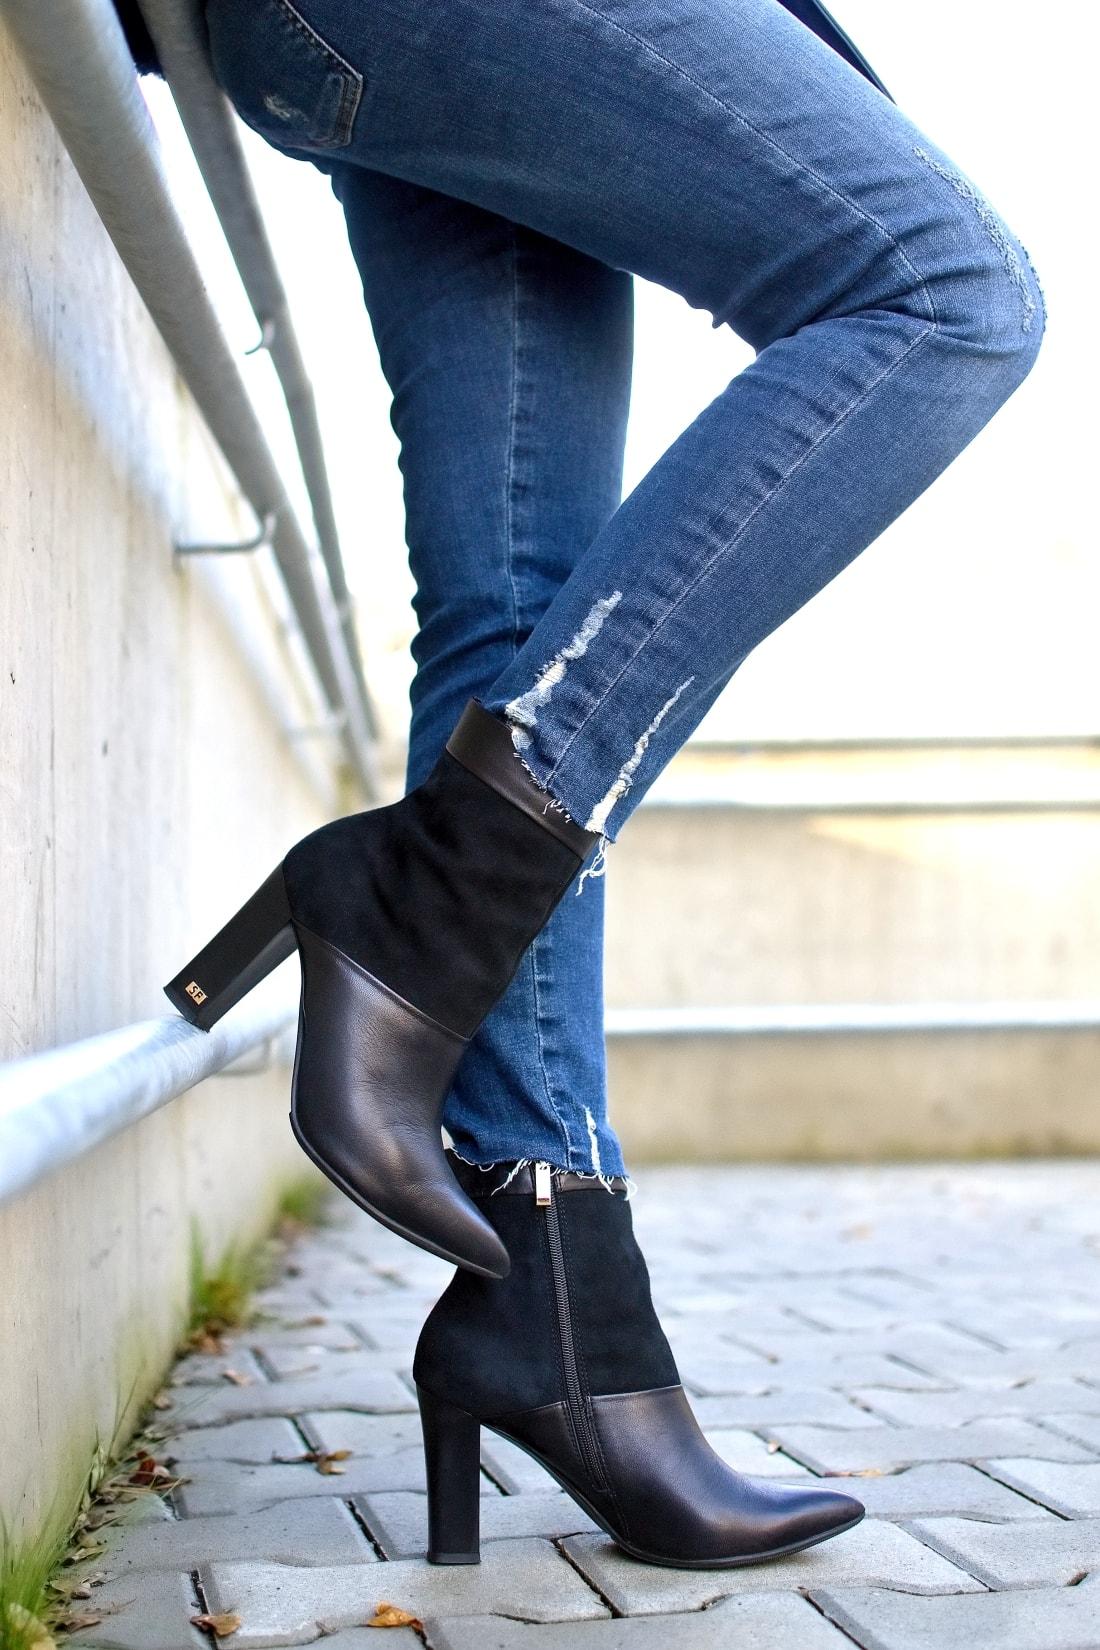 IRRESISTIBLE ME_Katharine-fashion is beautiful_blog 10_hair extension_irresistible me_beauty_Modrá kožušinová vesta_Katarína Jakubčová_Fashion blogger